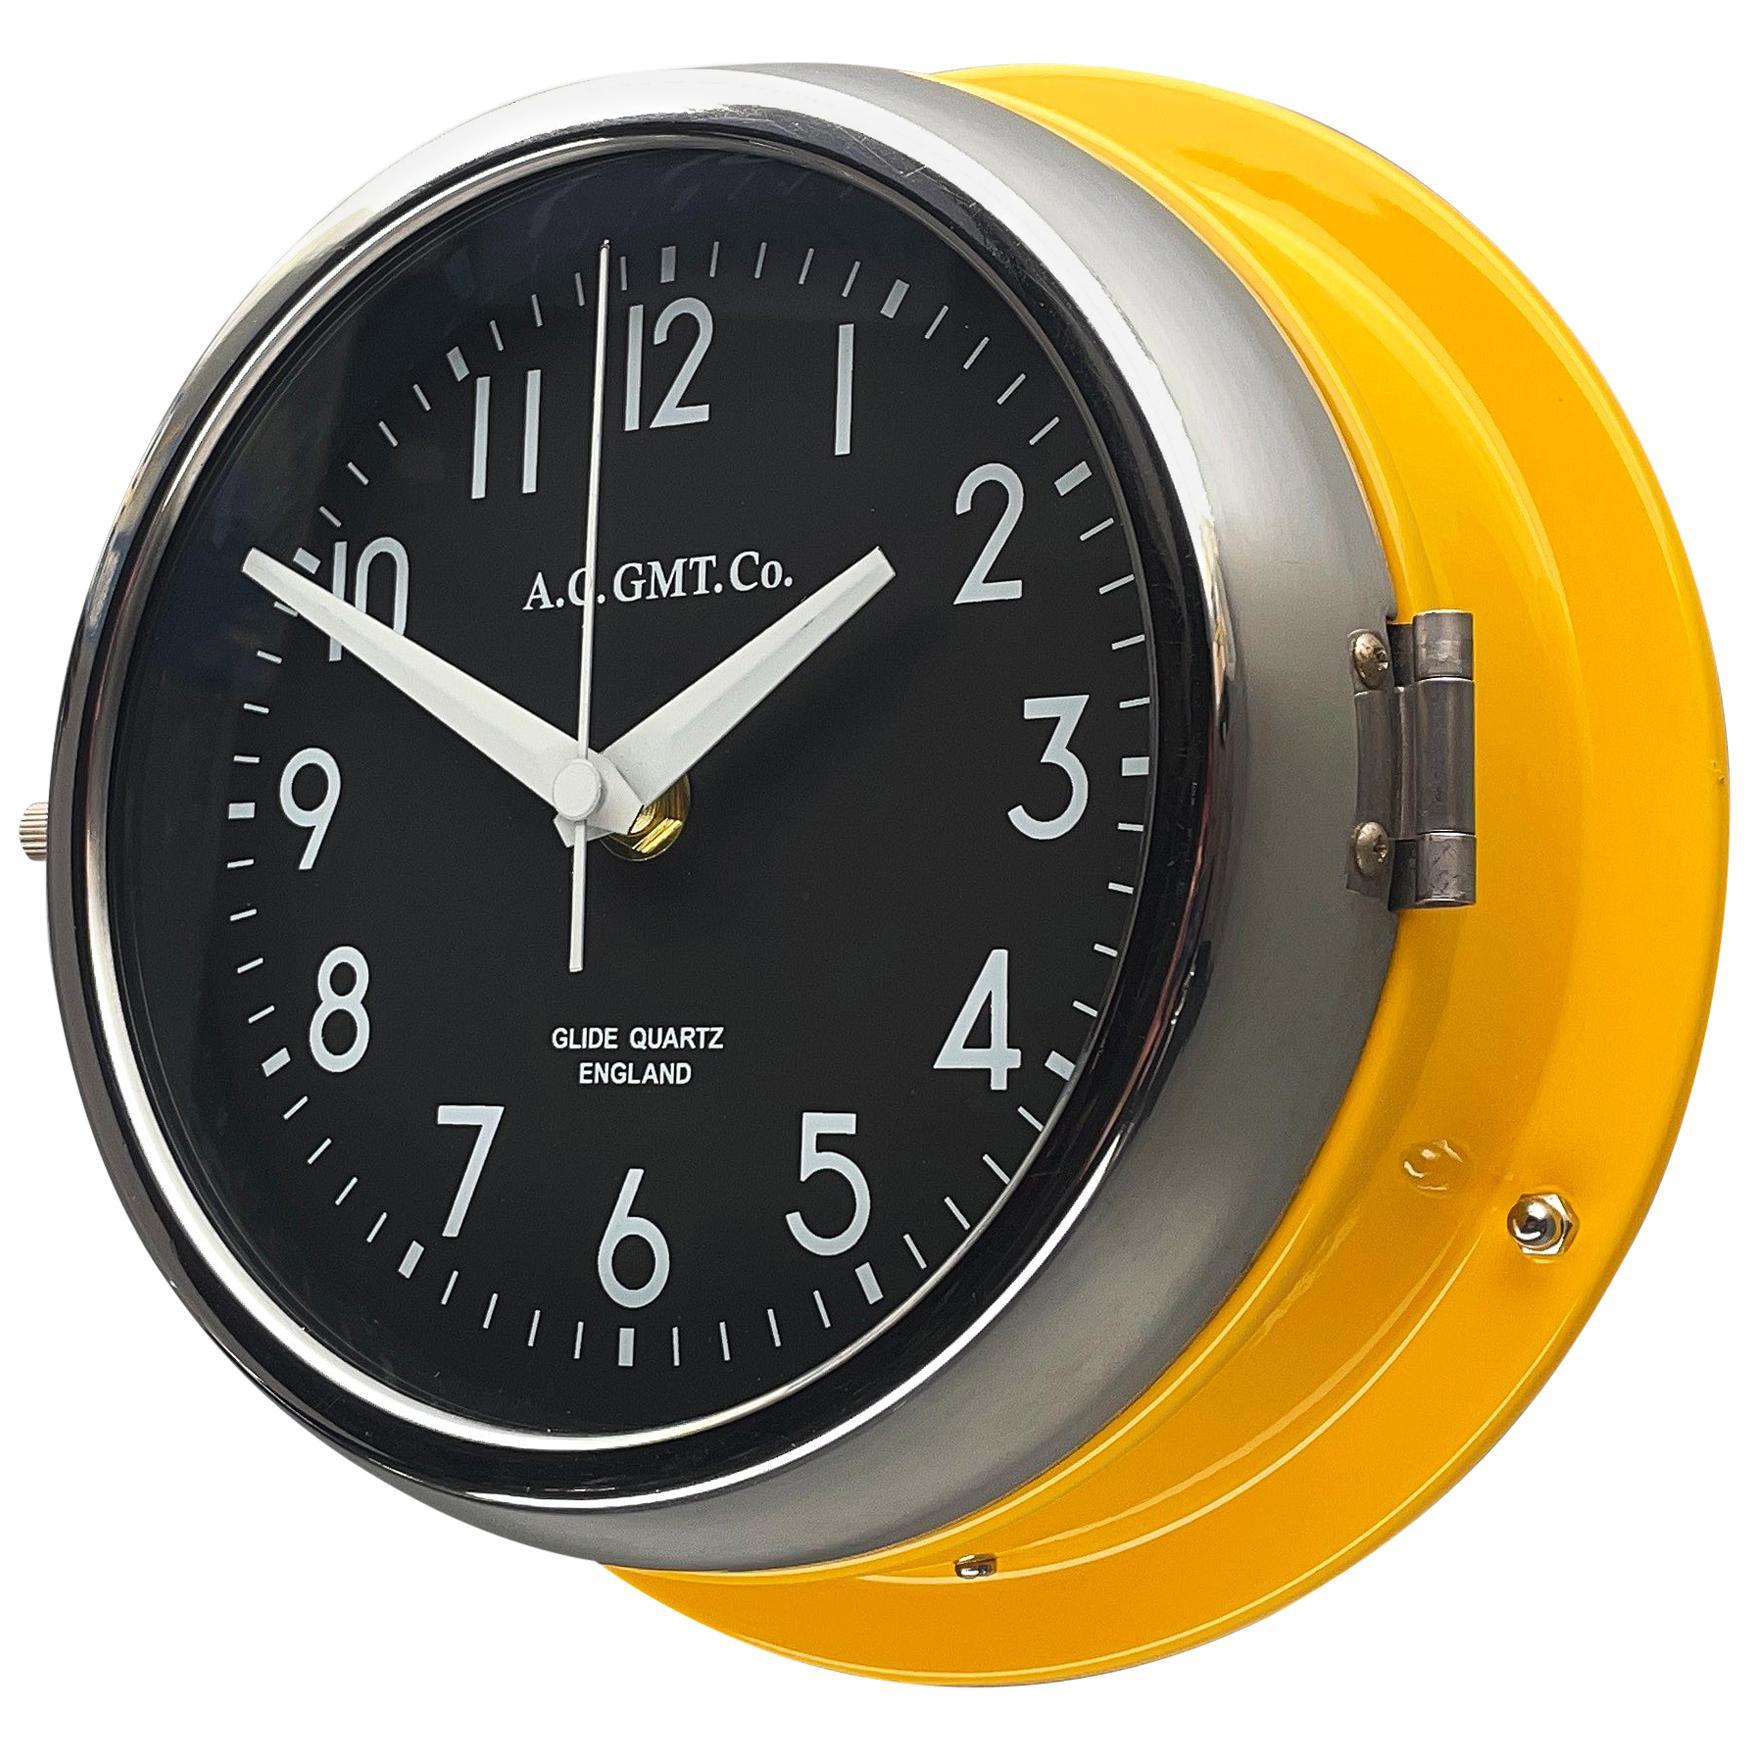 1970s British Yellow Illumination AC GMT Co. Classic Quartz Wall Clock